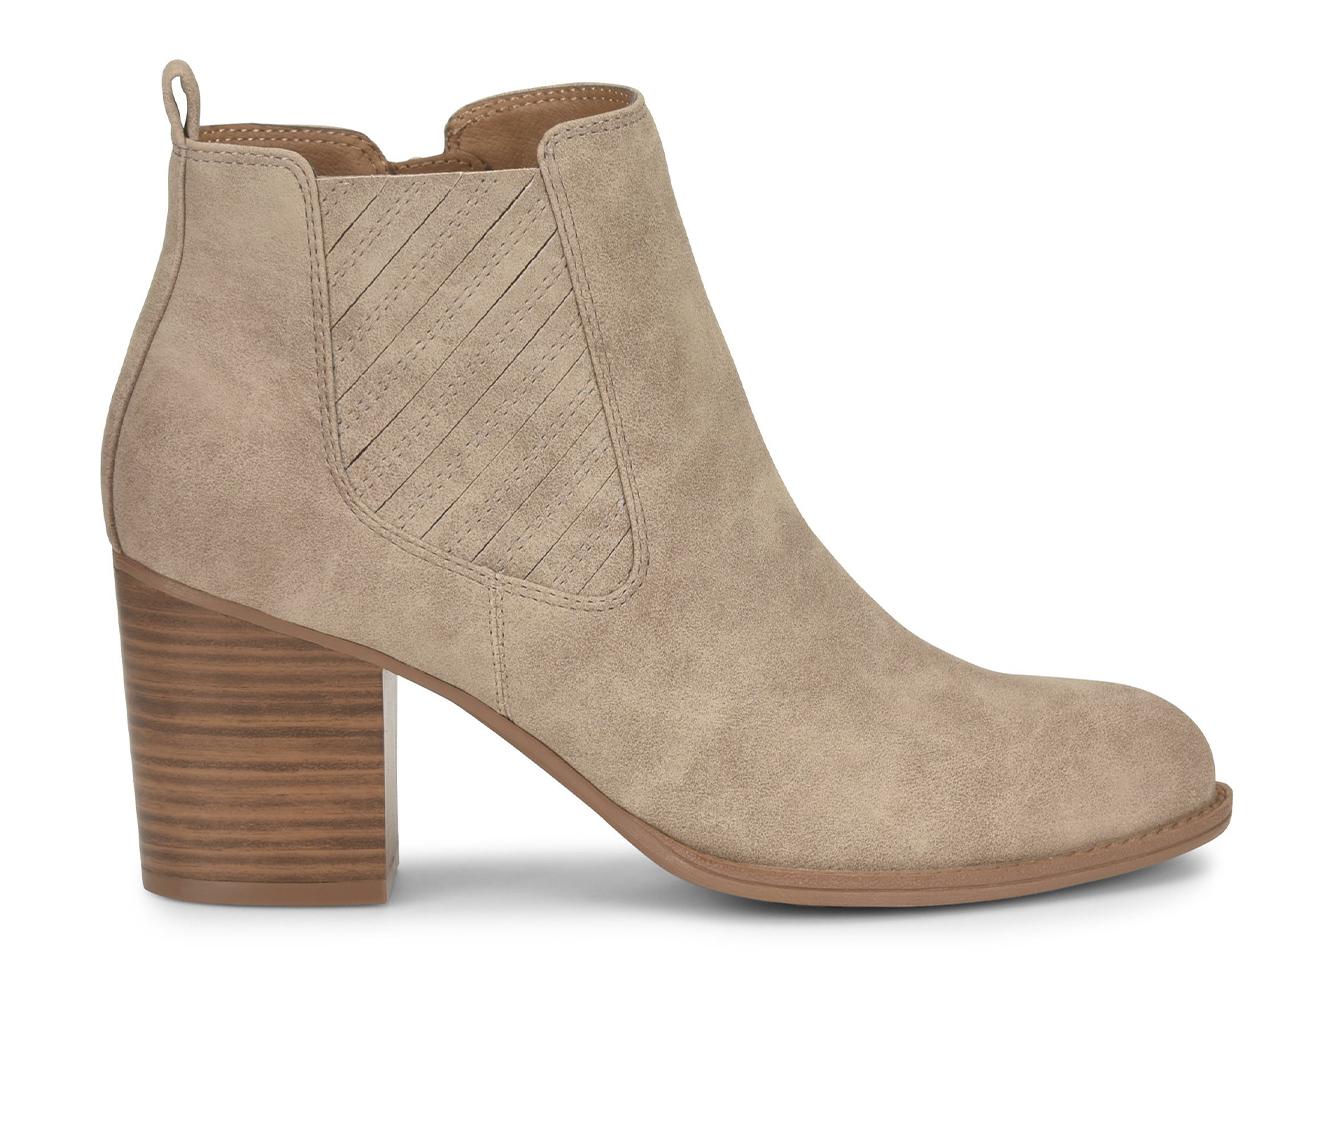 EuroSoft Salida Women's Boots (Beige - Faux Leather)